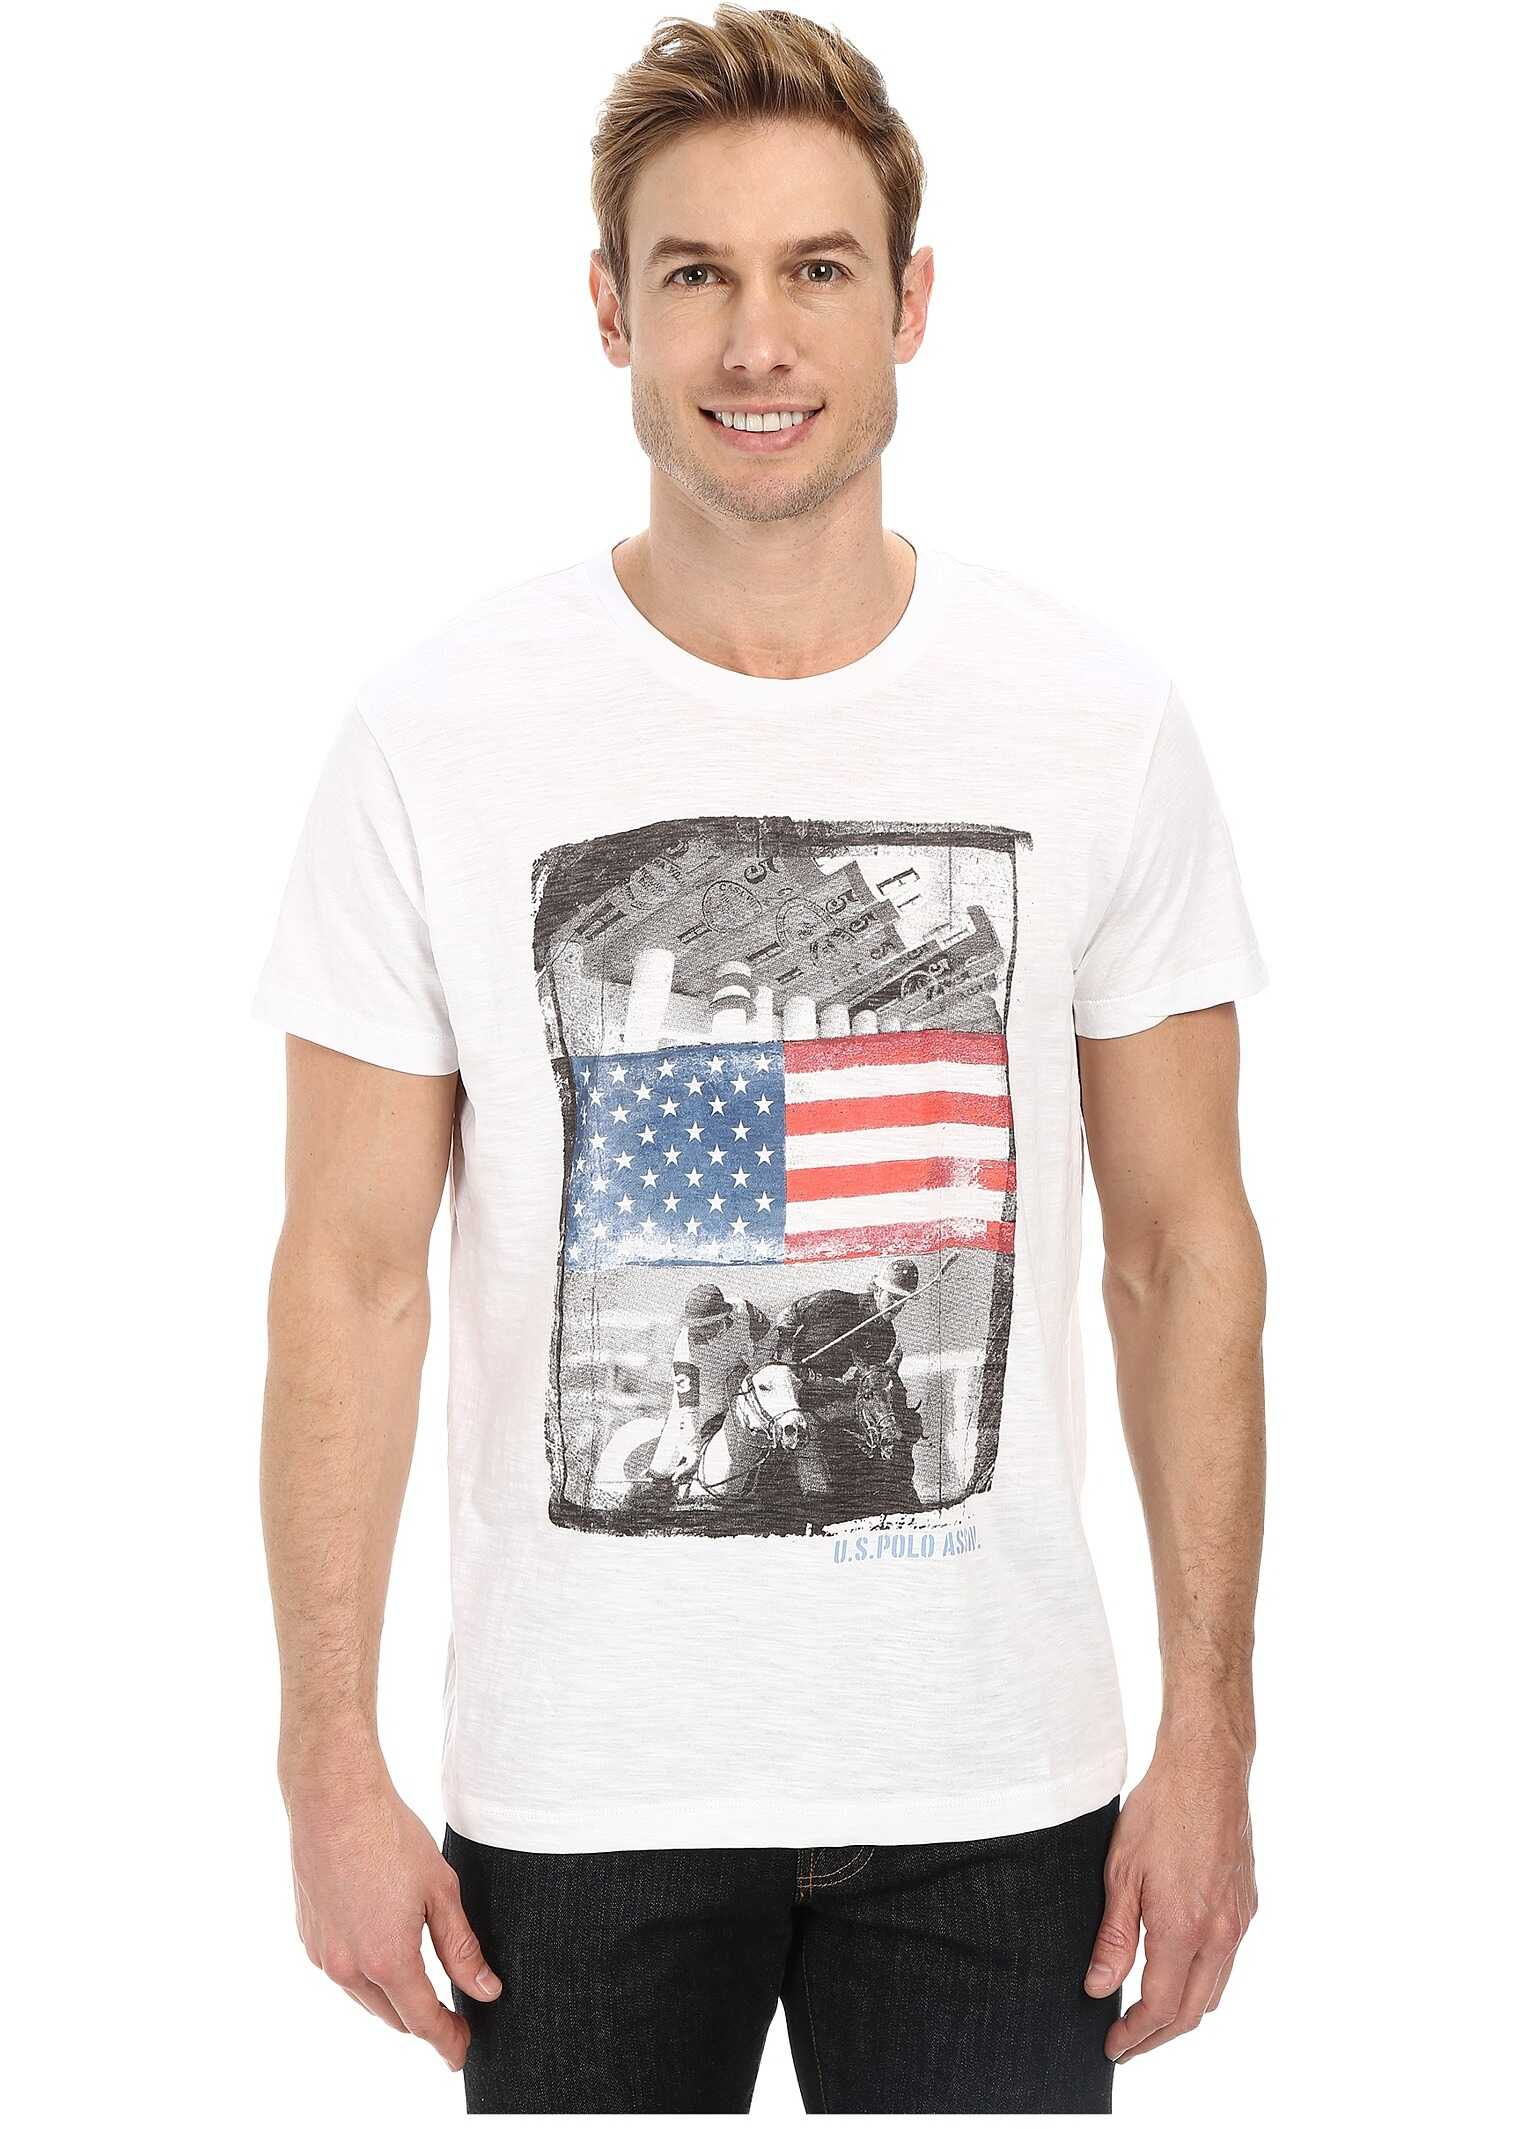 U.S. POLO ASSN. Polo Print T-Shirt White